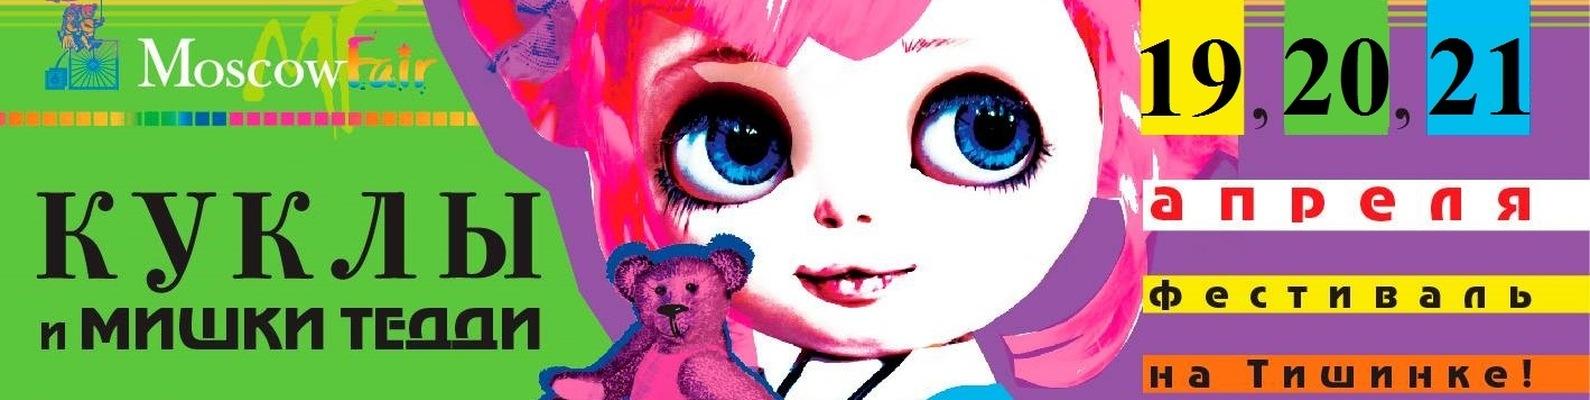 56566bb72109 Выставка кукол и мишек Тедди Moscow Fair   ВКонтакте